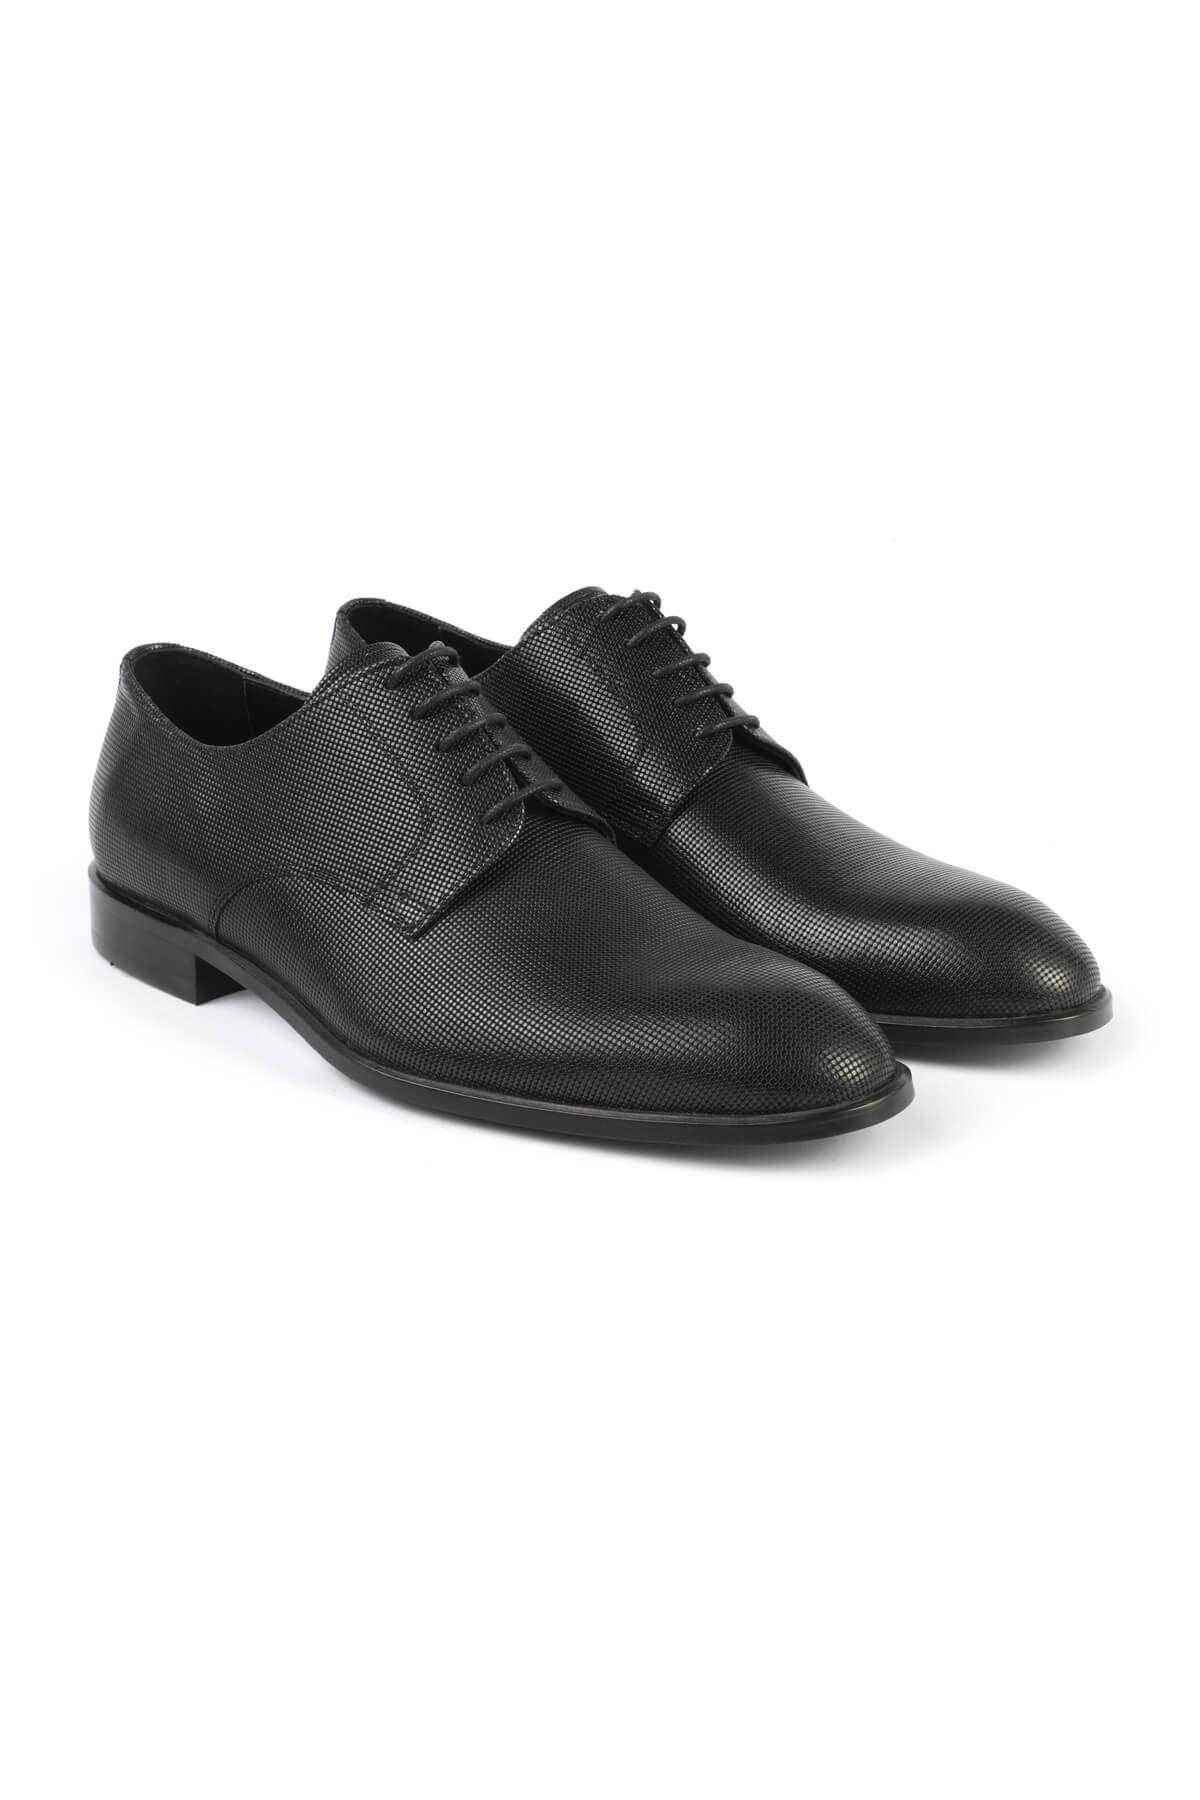 Libero 2716 Black Classic Shoes